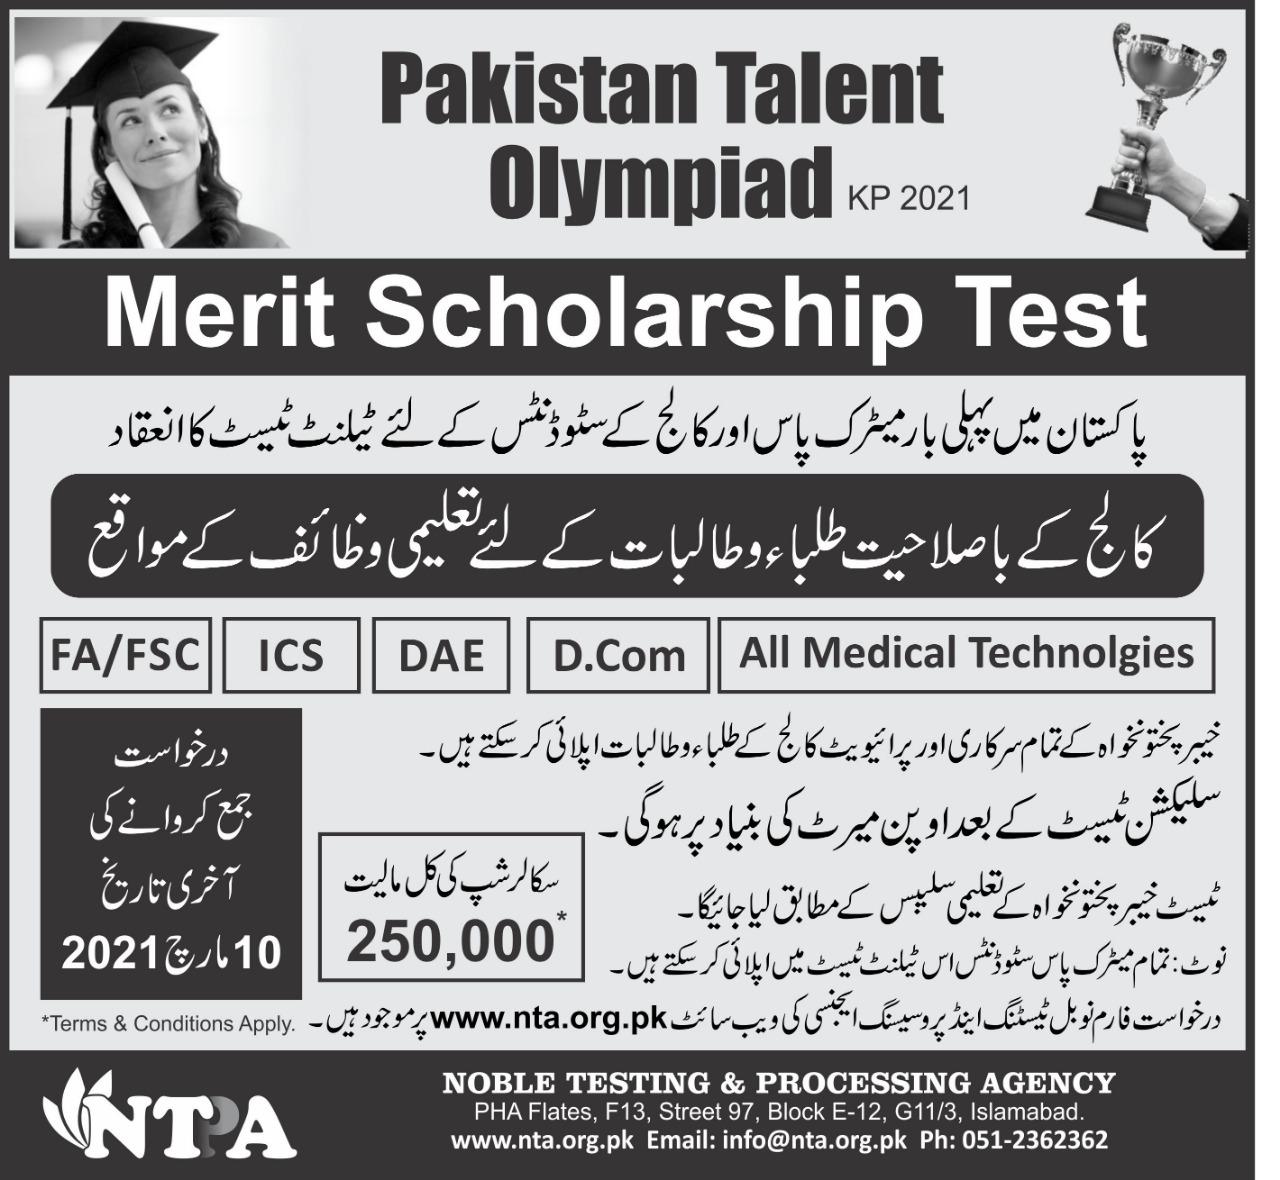 Pakistan Talent Olympiad KPK Merit Scholarship Test NTPA Result